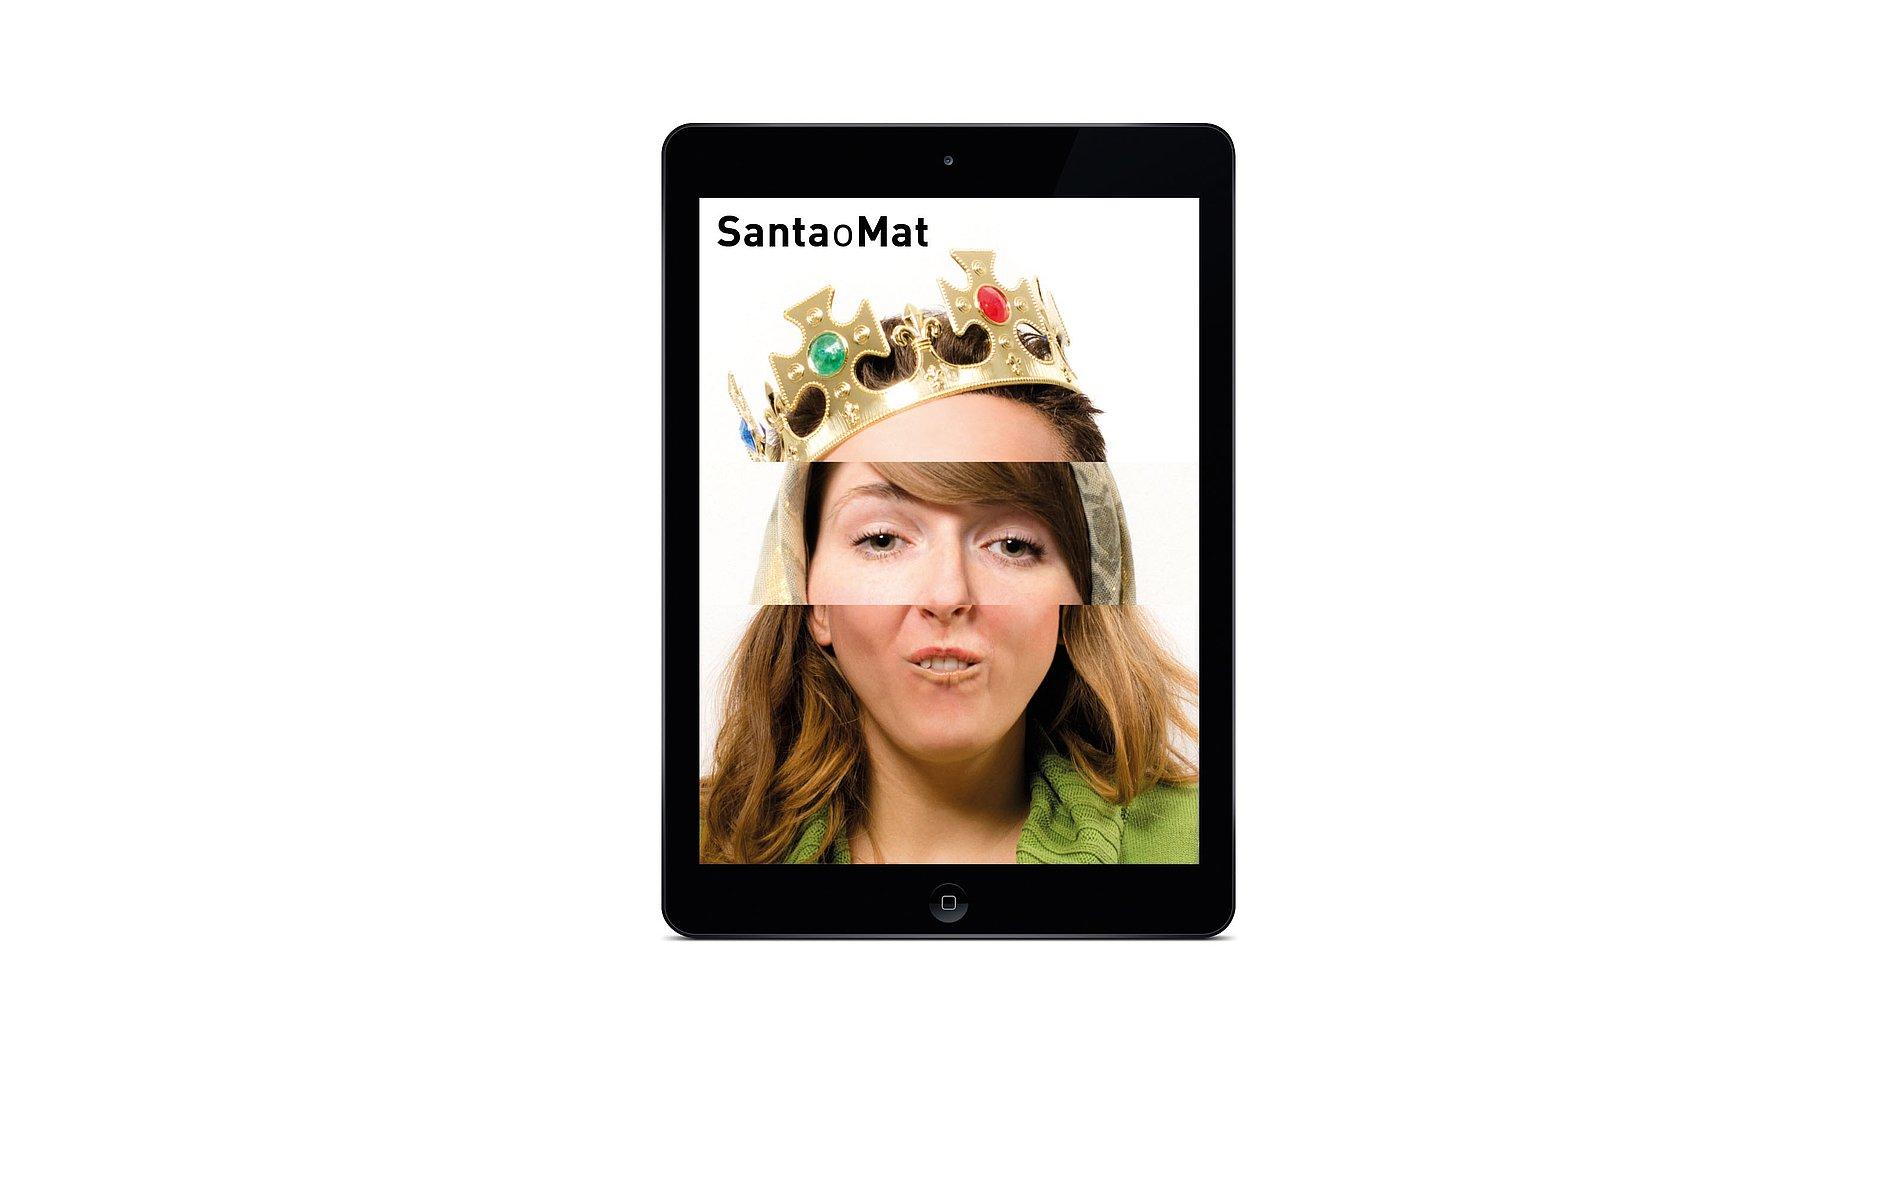 Santa-o-Mat Shake Your X-Mas Card | Red Dot Design Award